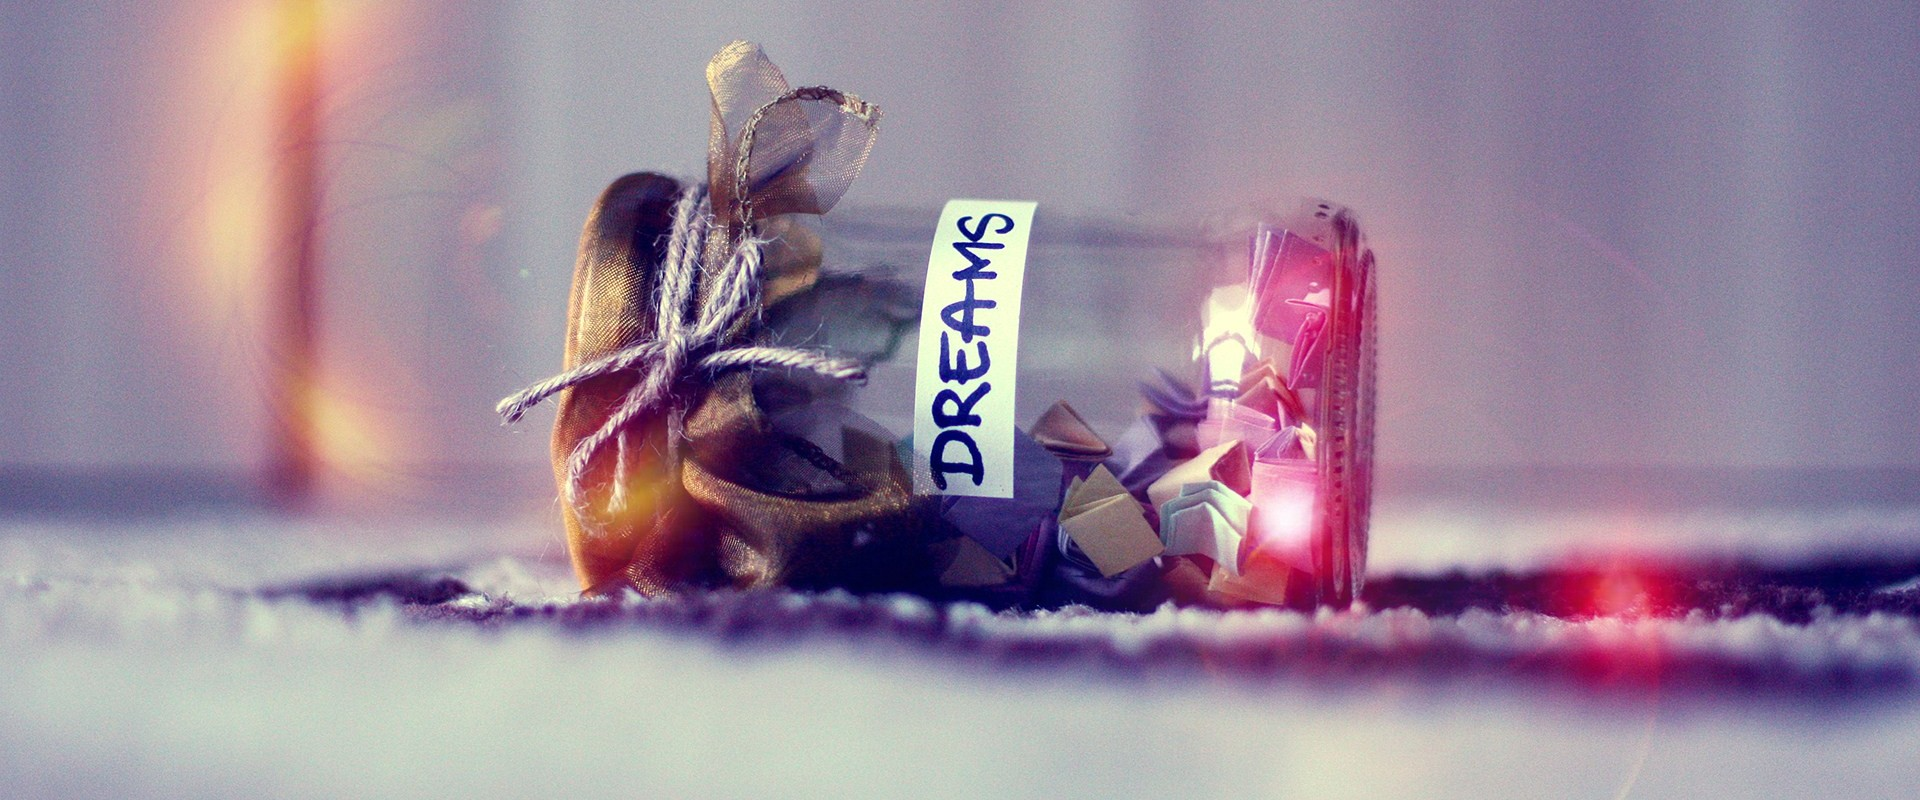 dreams-photo-light-gift-glass